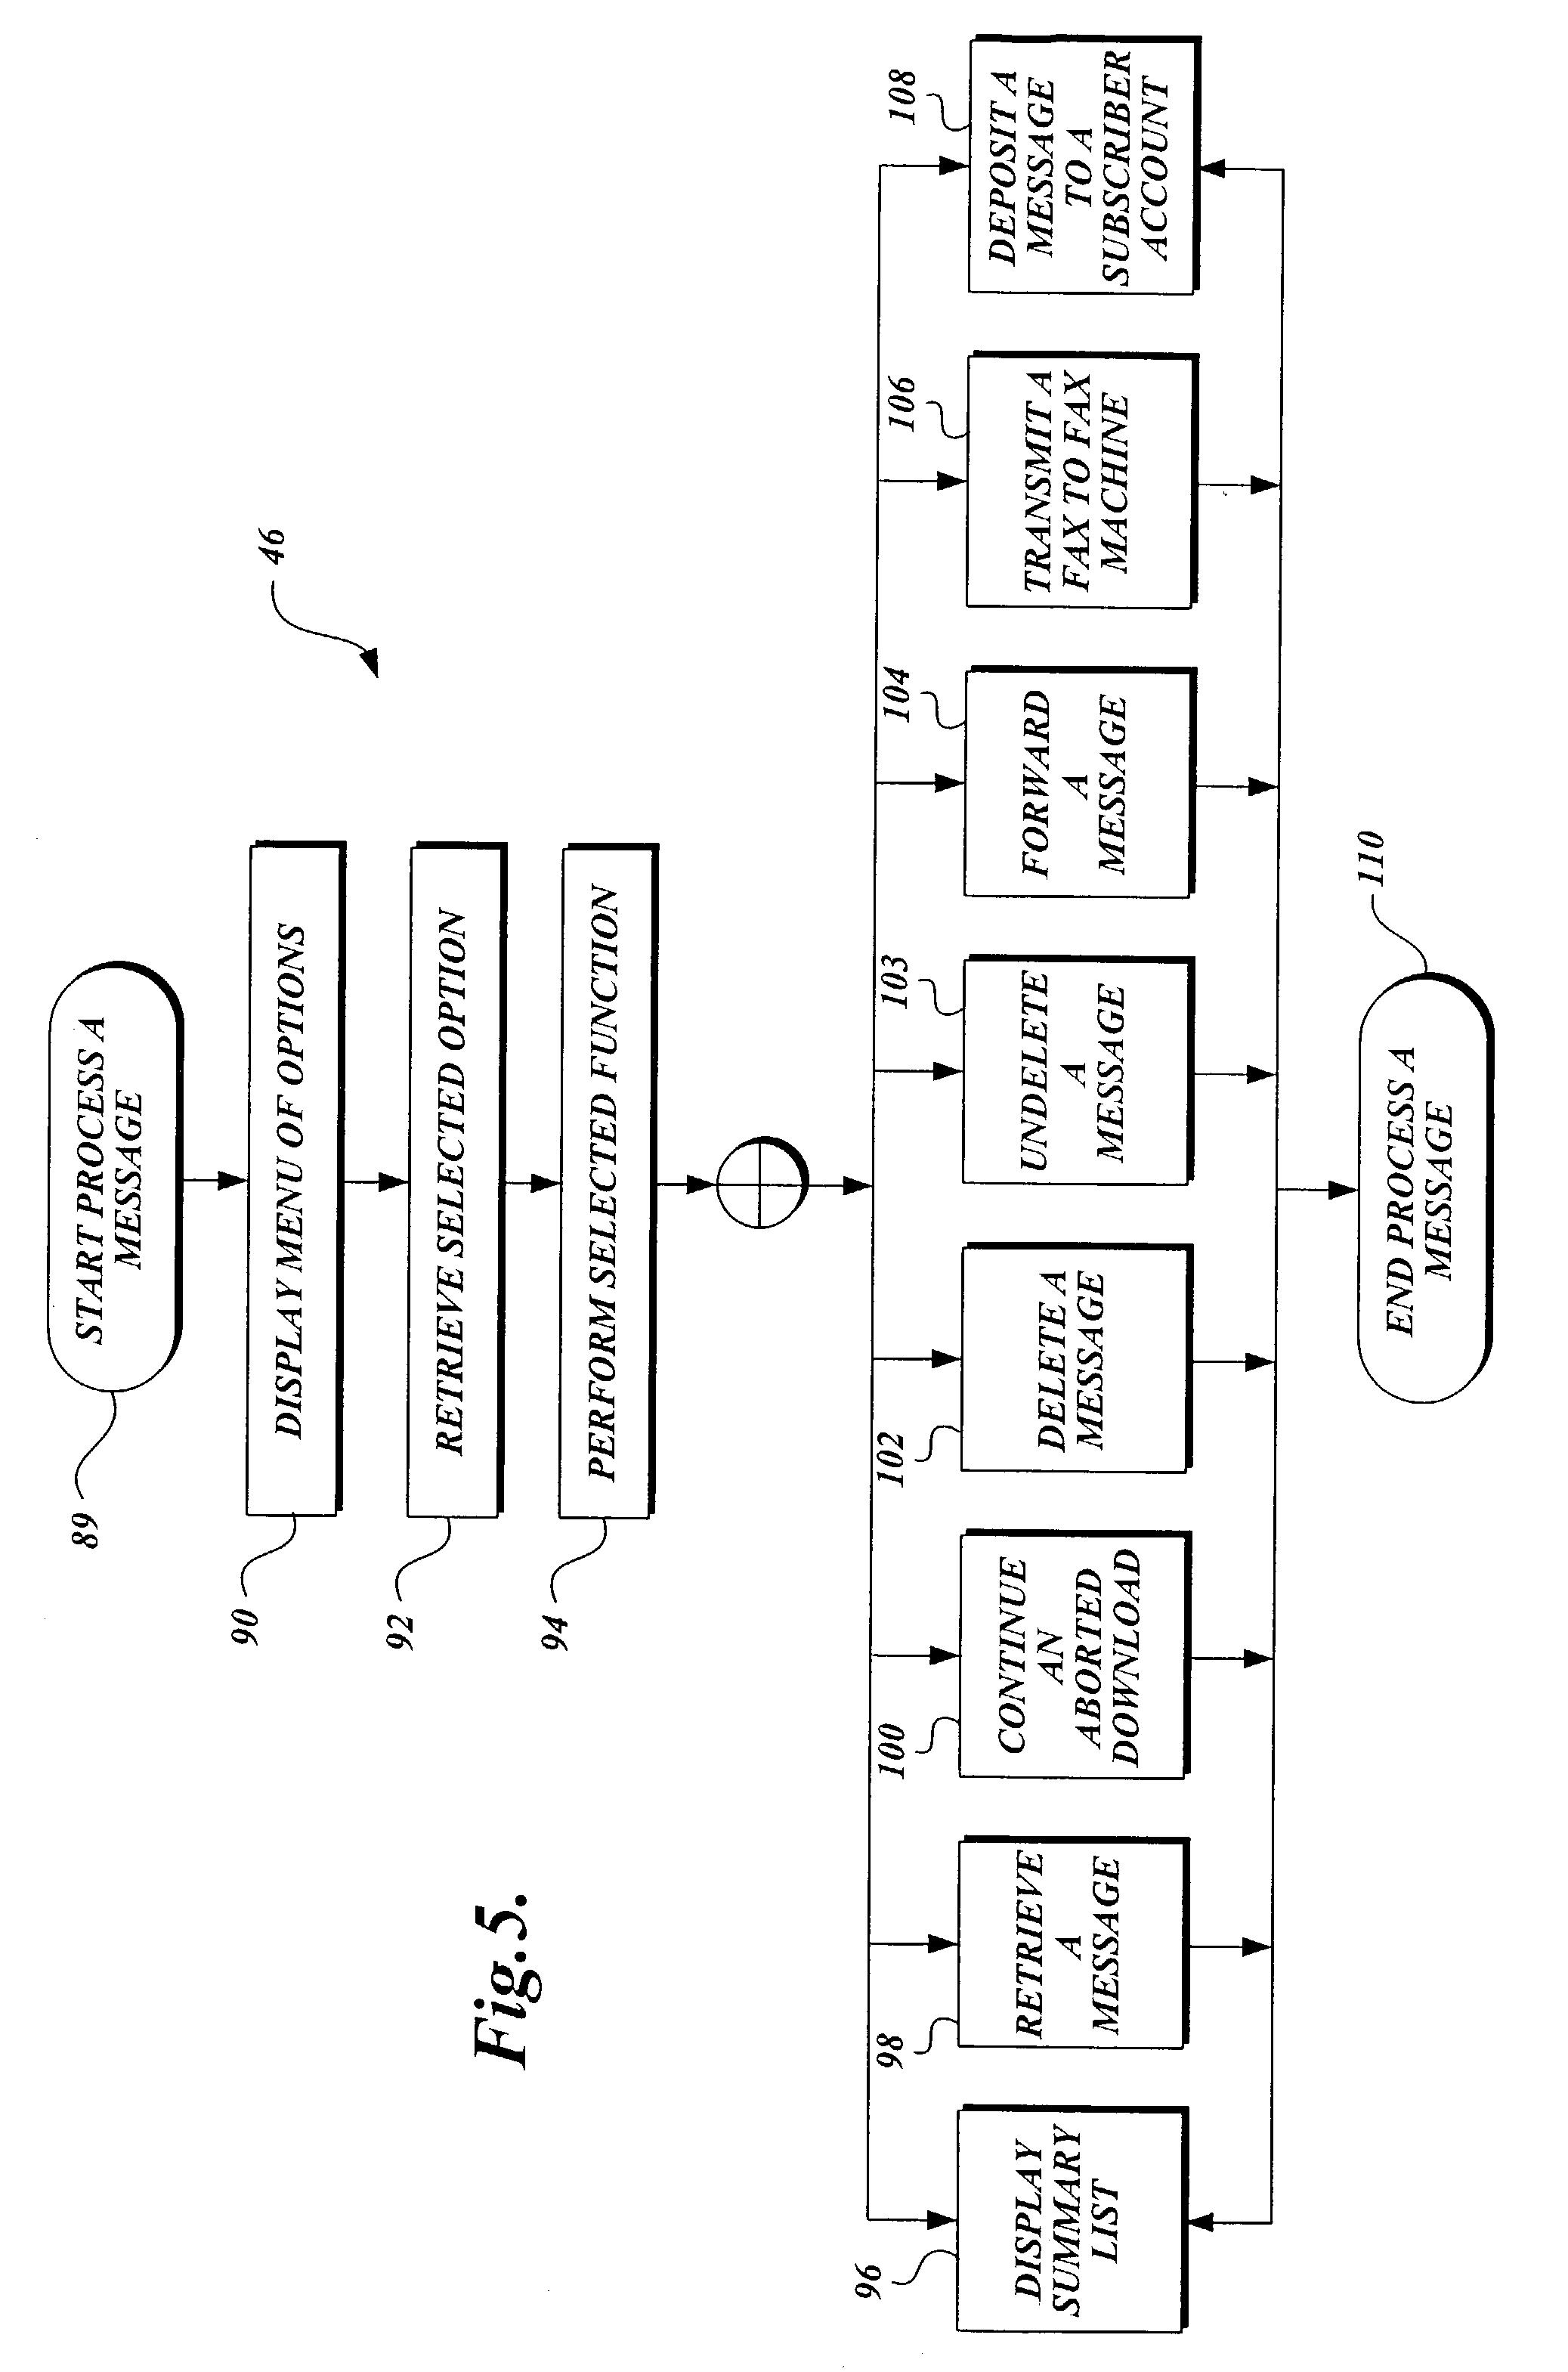 client origination and authorship system